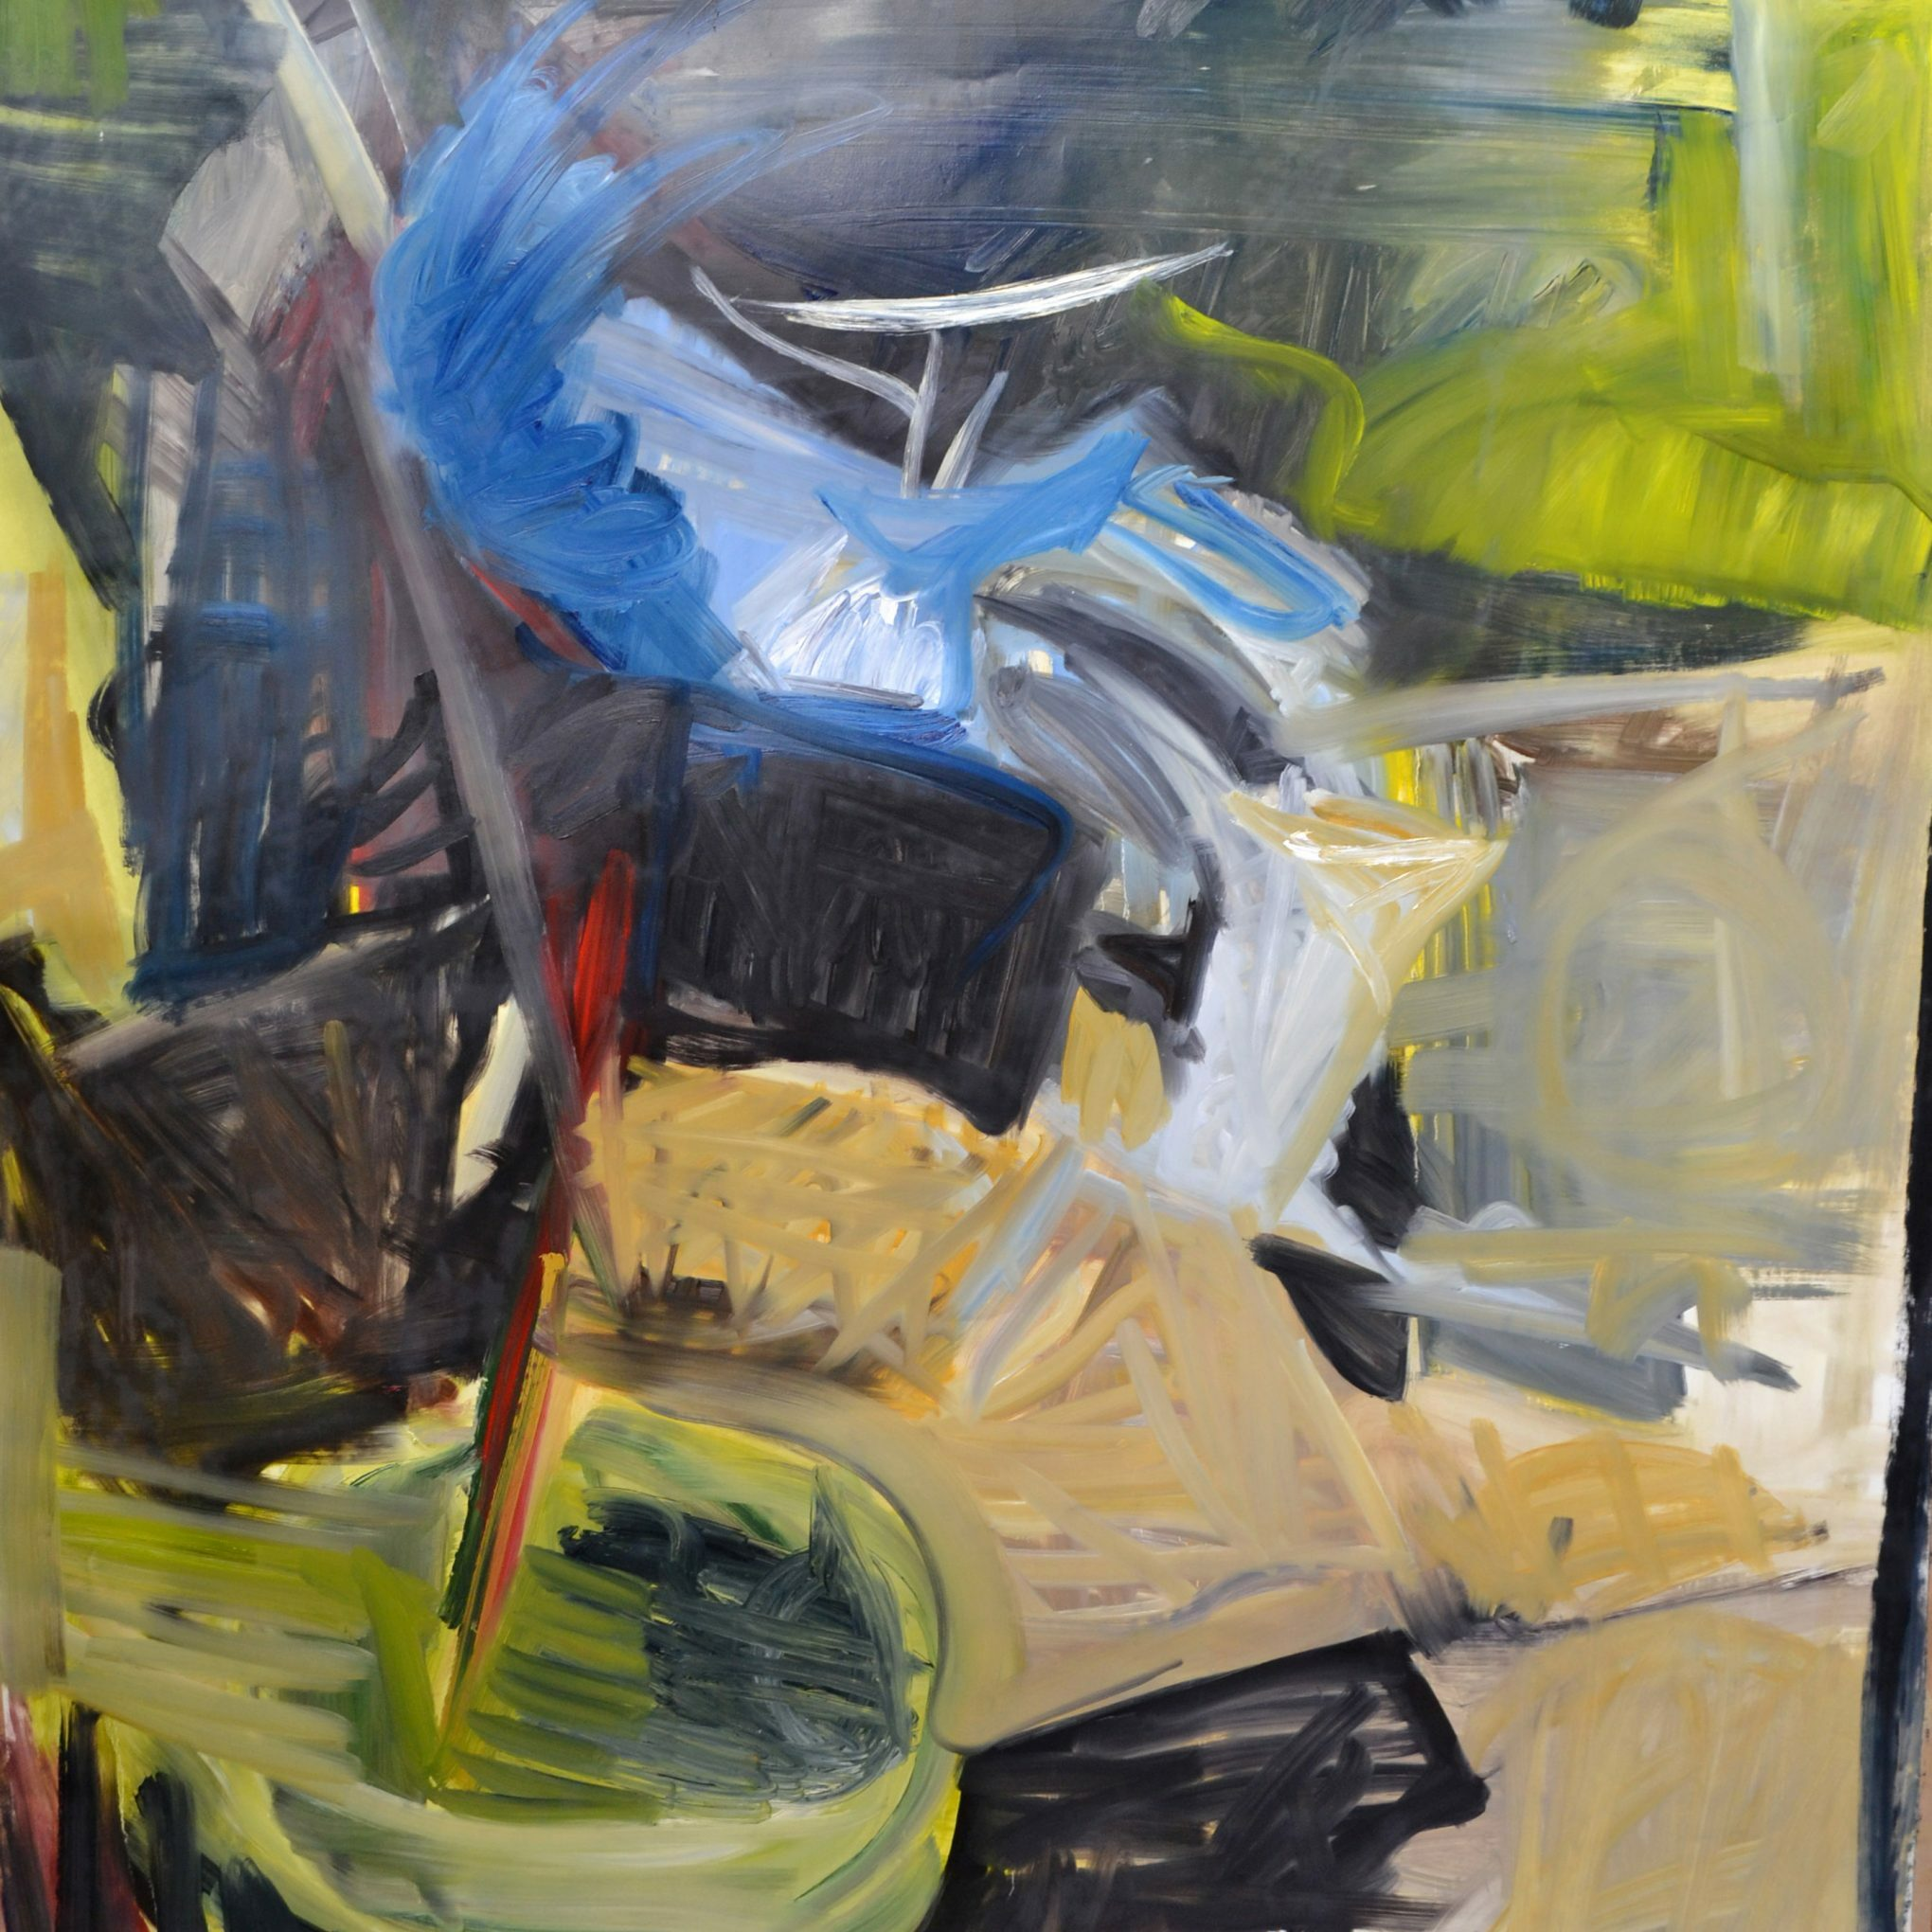 Studio 5 2016-17 210 x 140 cm oil on paper